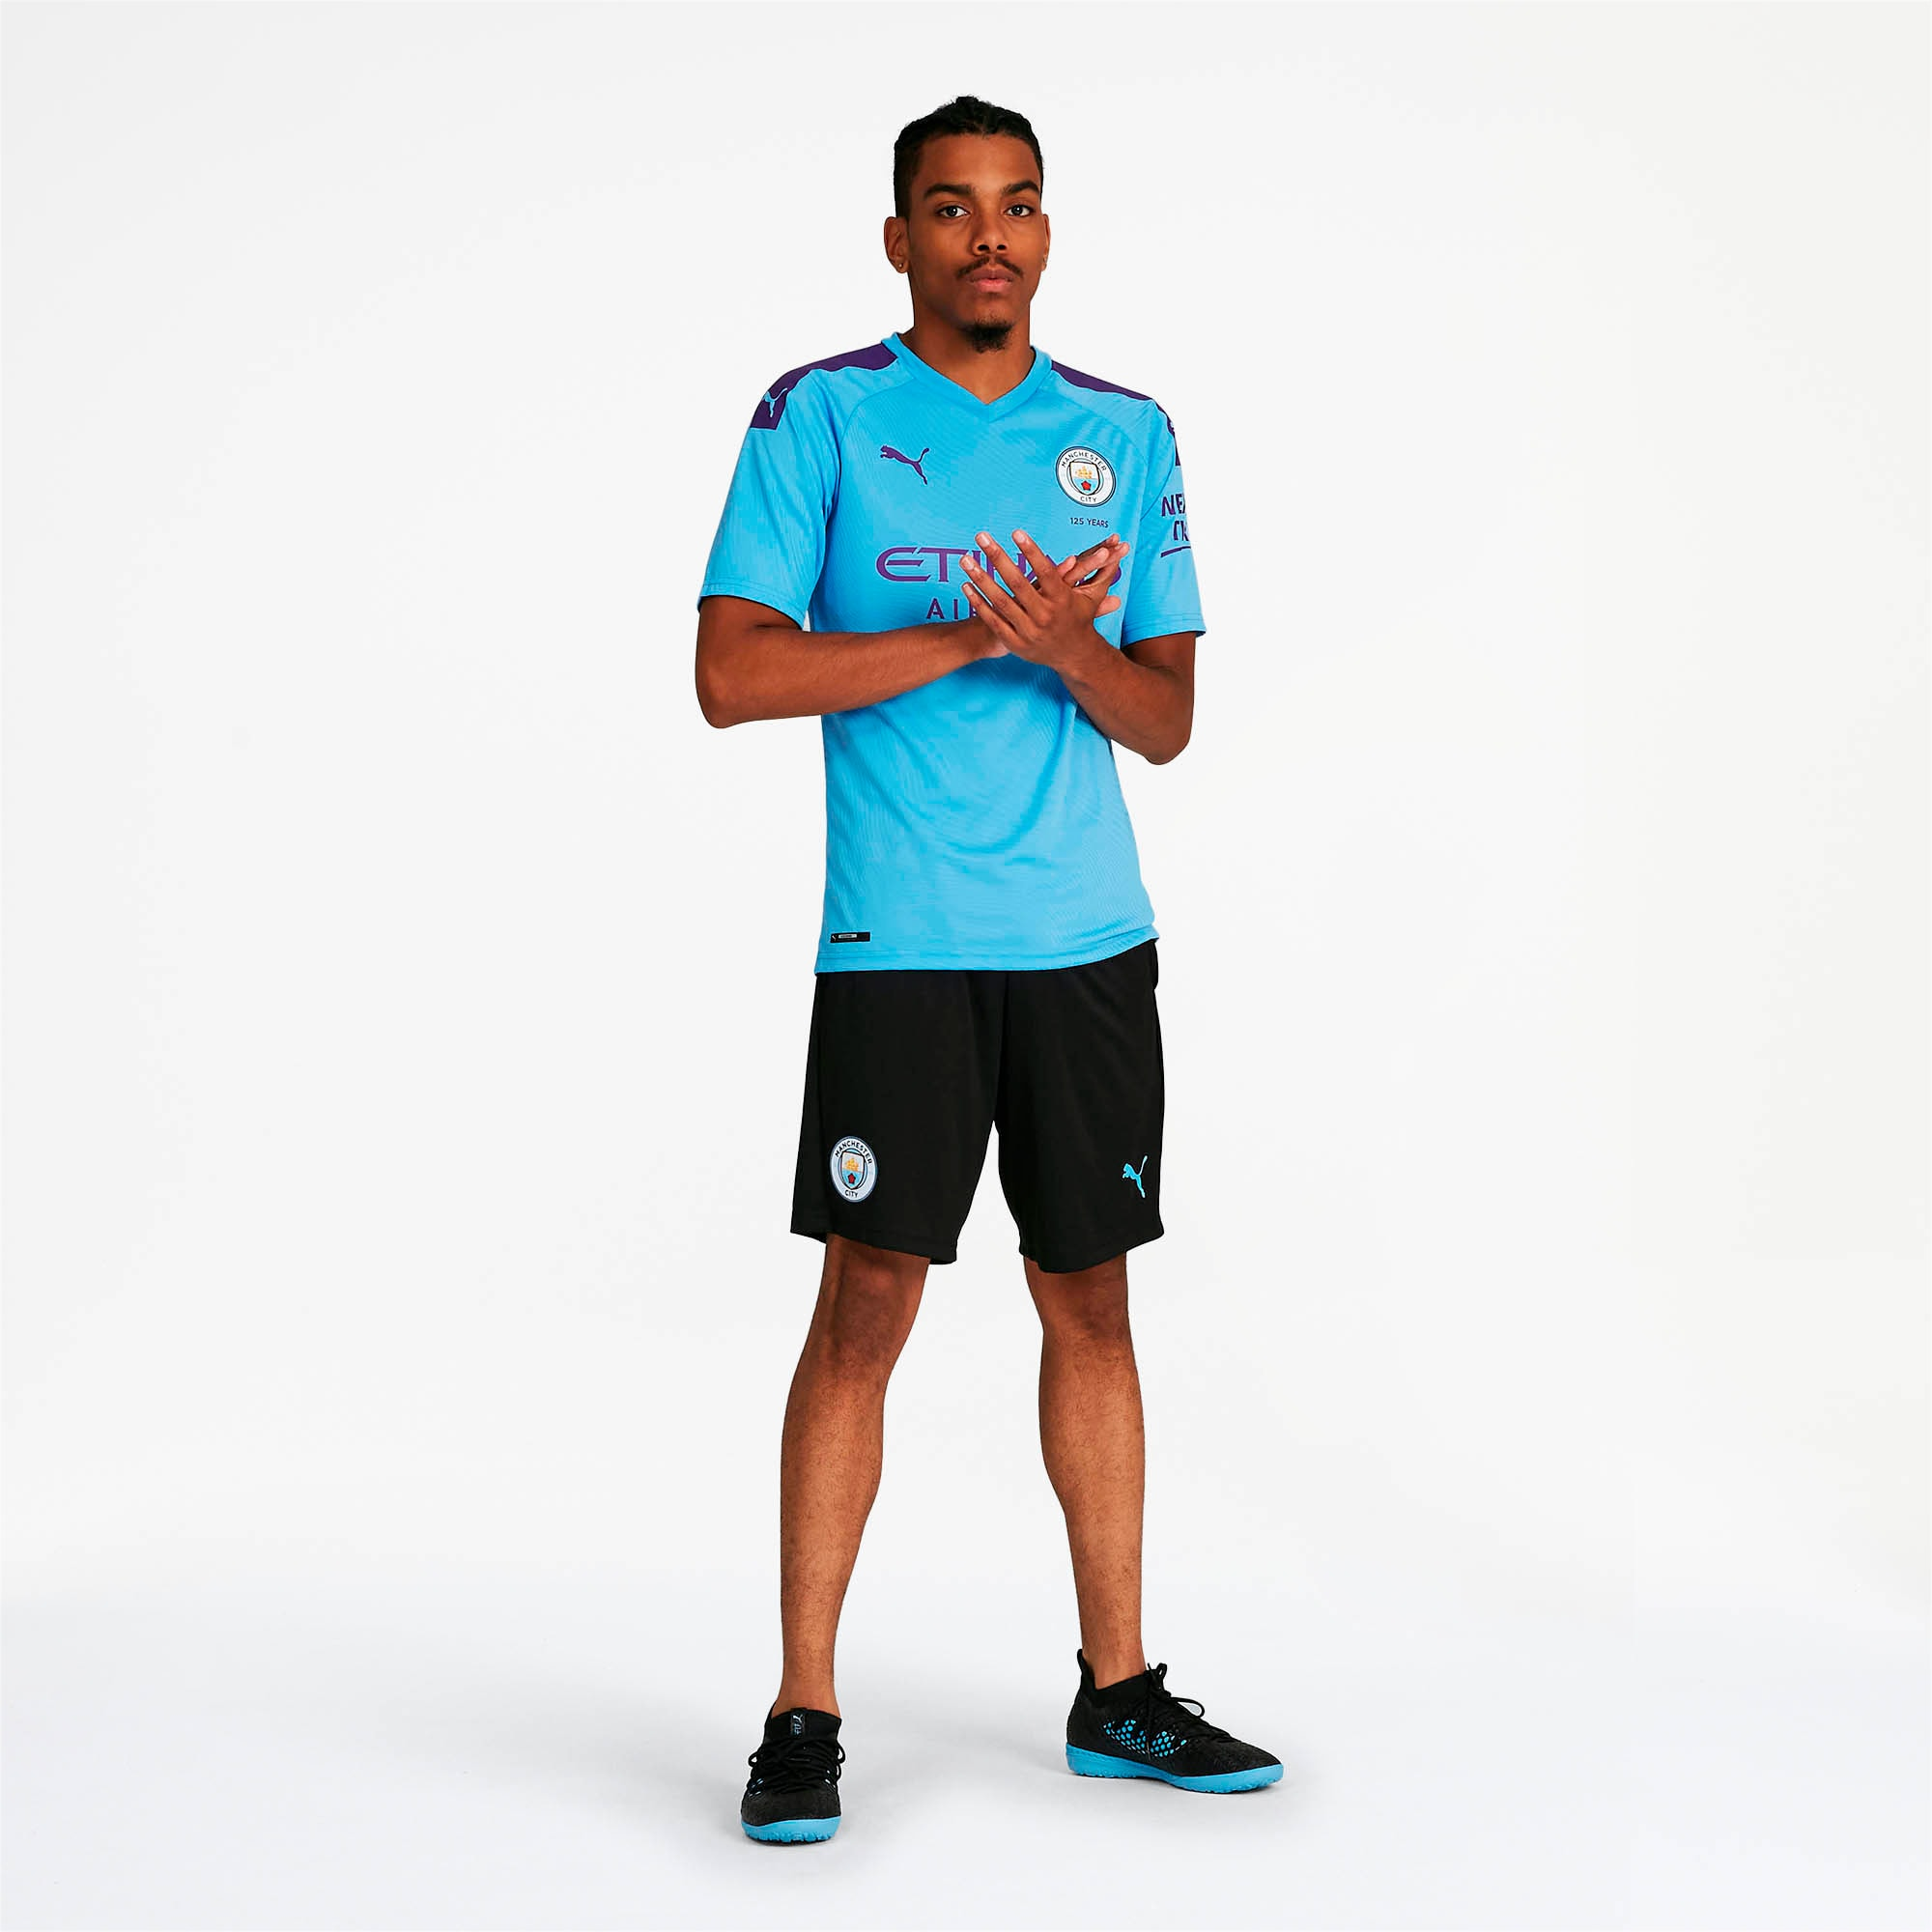 Thumbnail 3 of Manchester City FC Men's Training Shorts, Puma Black-Team Light Blue, medium